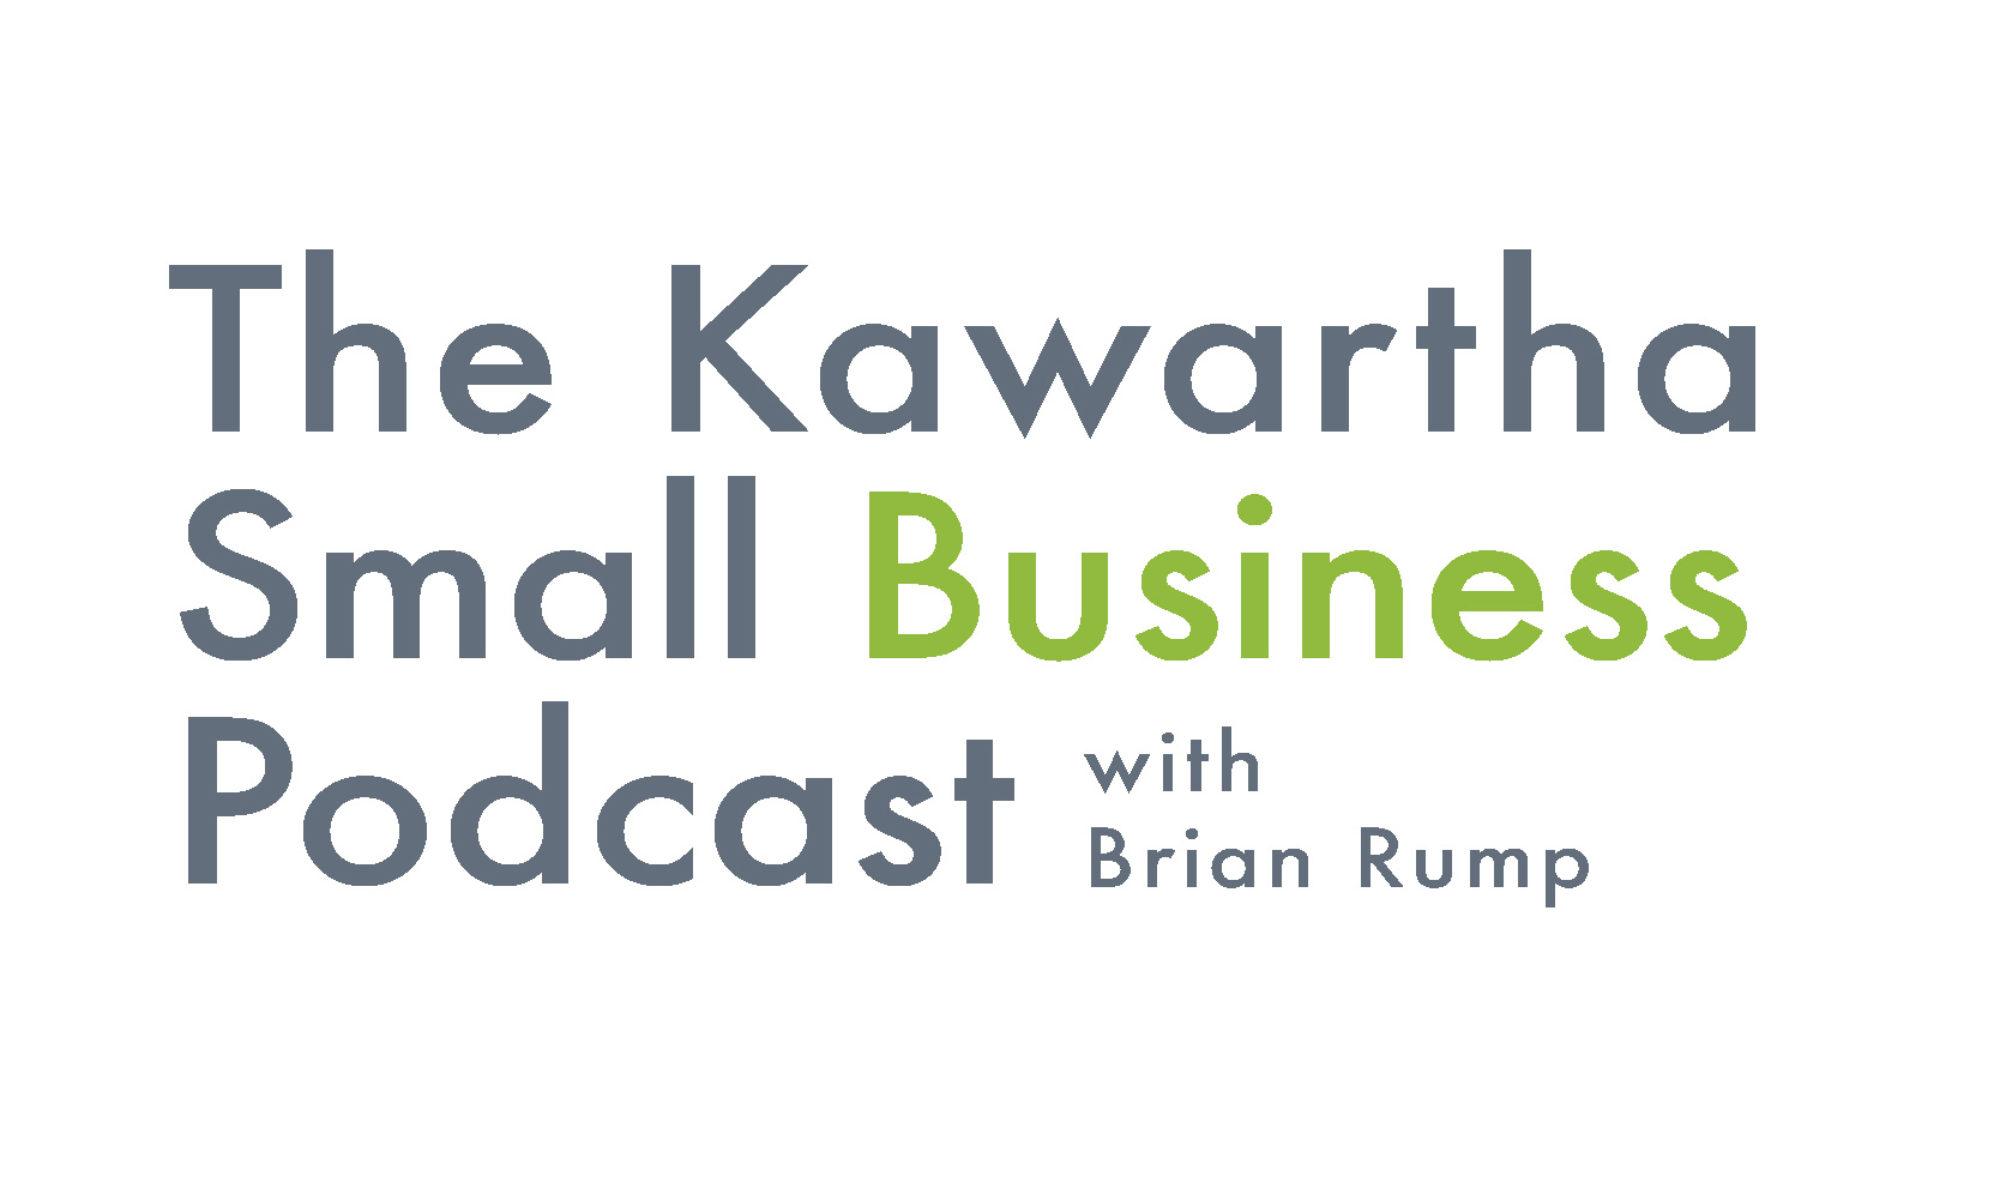 The Kawartha Small Business Podcast